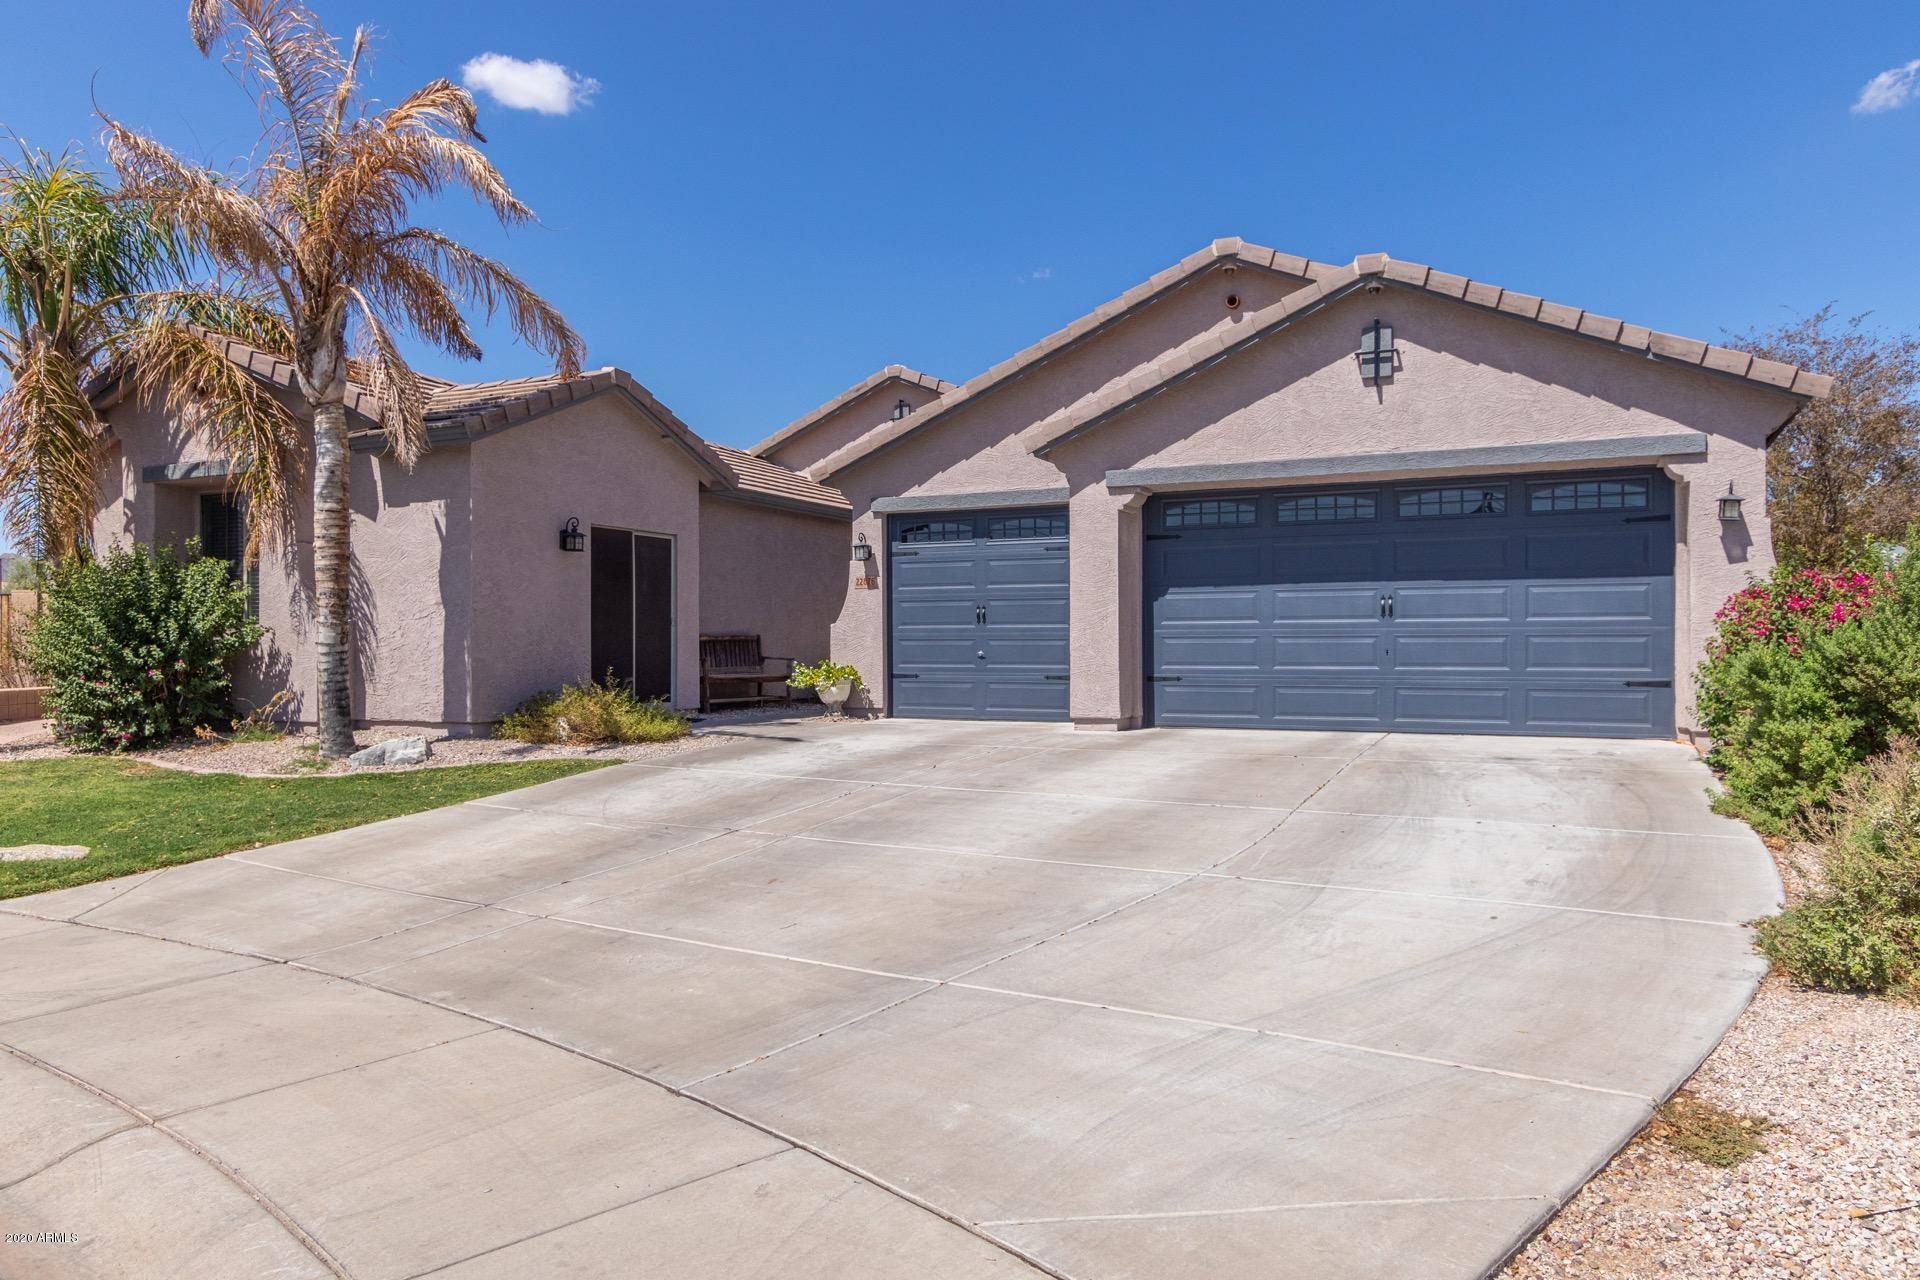 22876 W HOPI Street, Buckeye, AZ 85326 - MLS#: 6124313